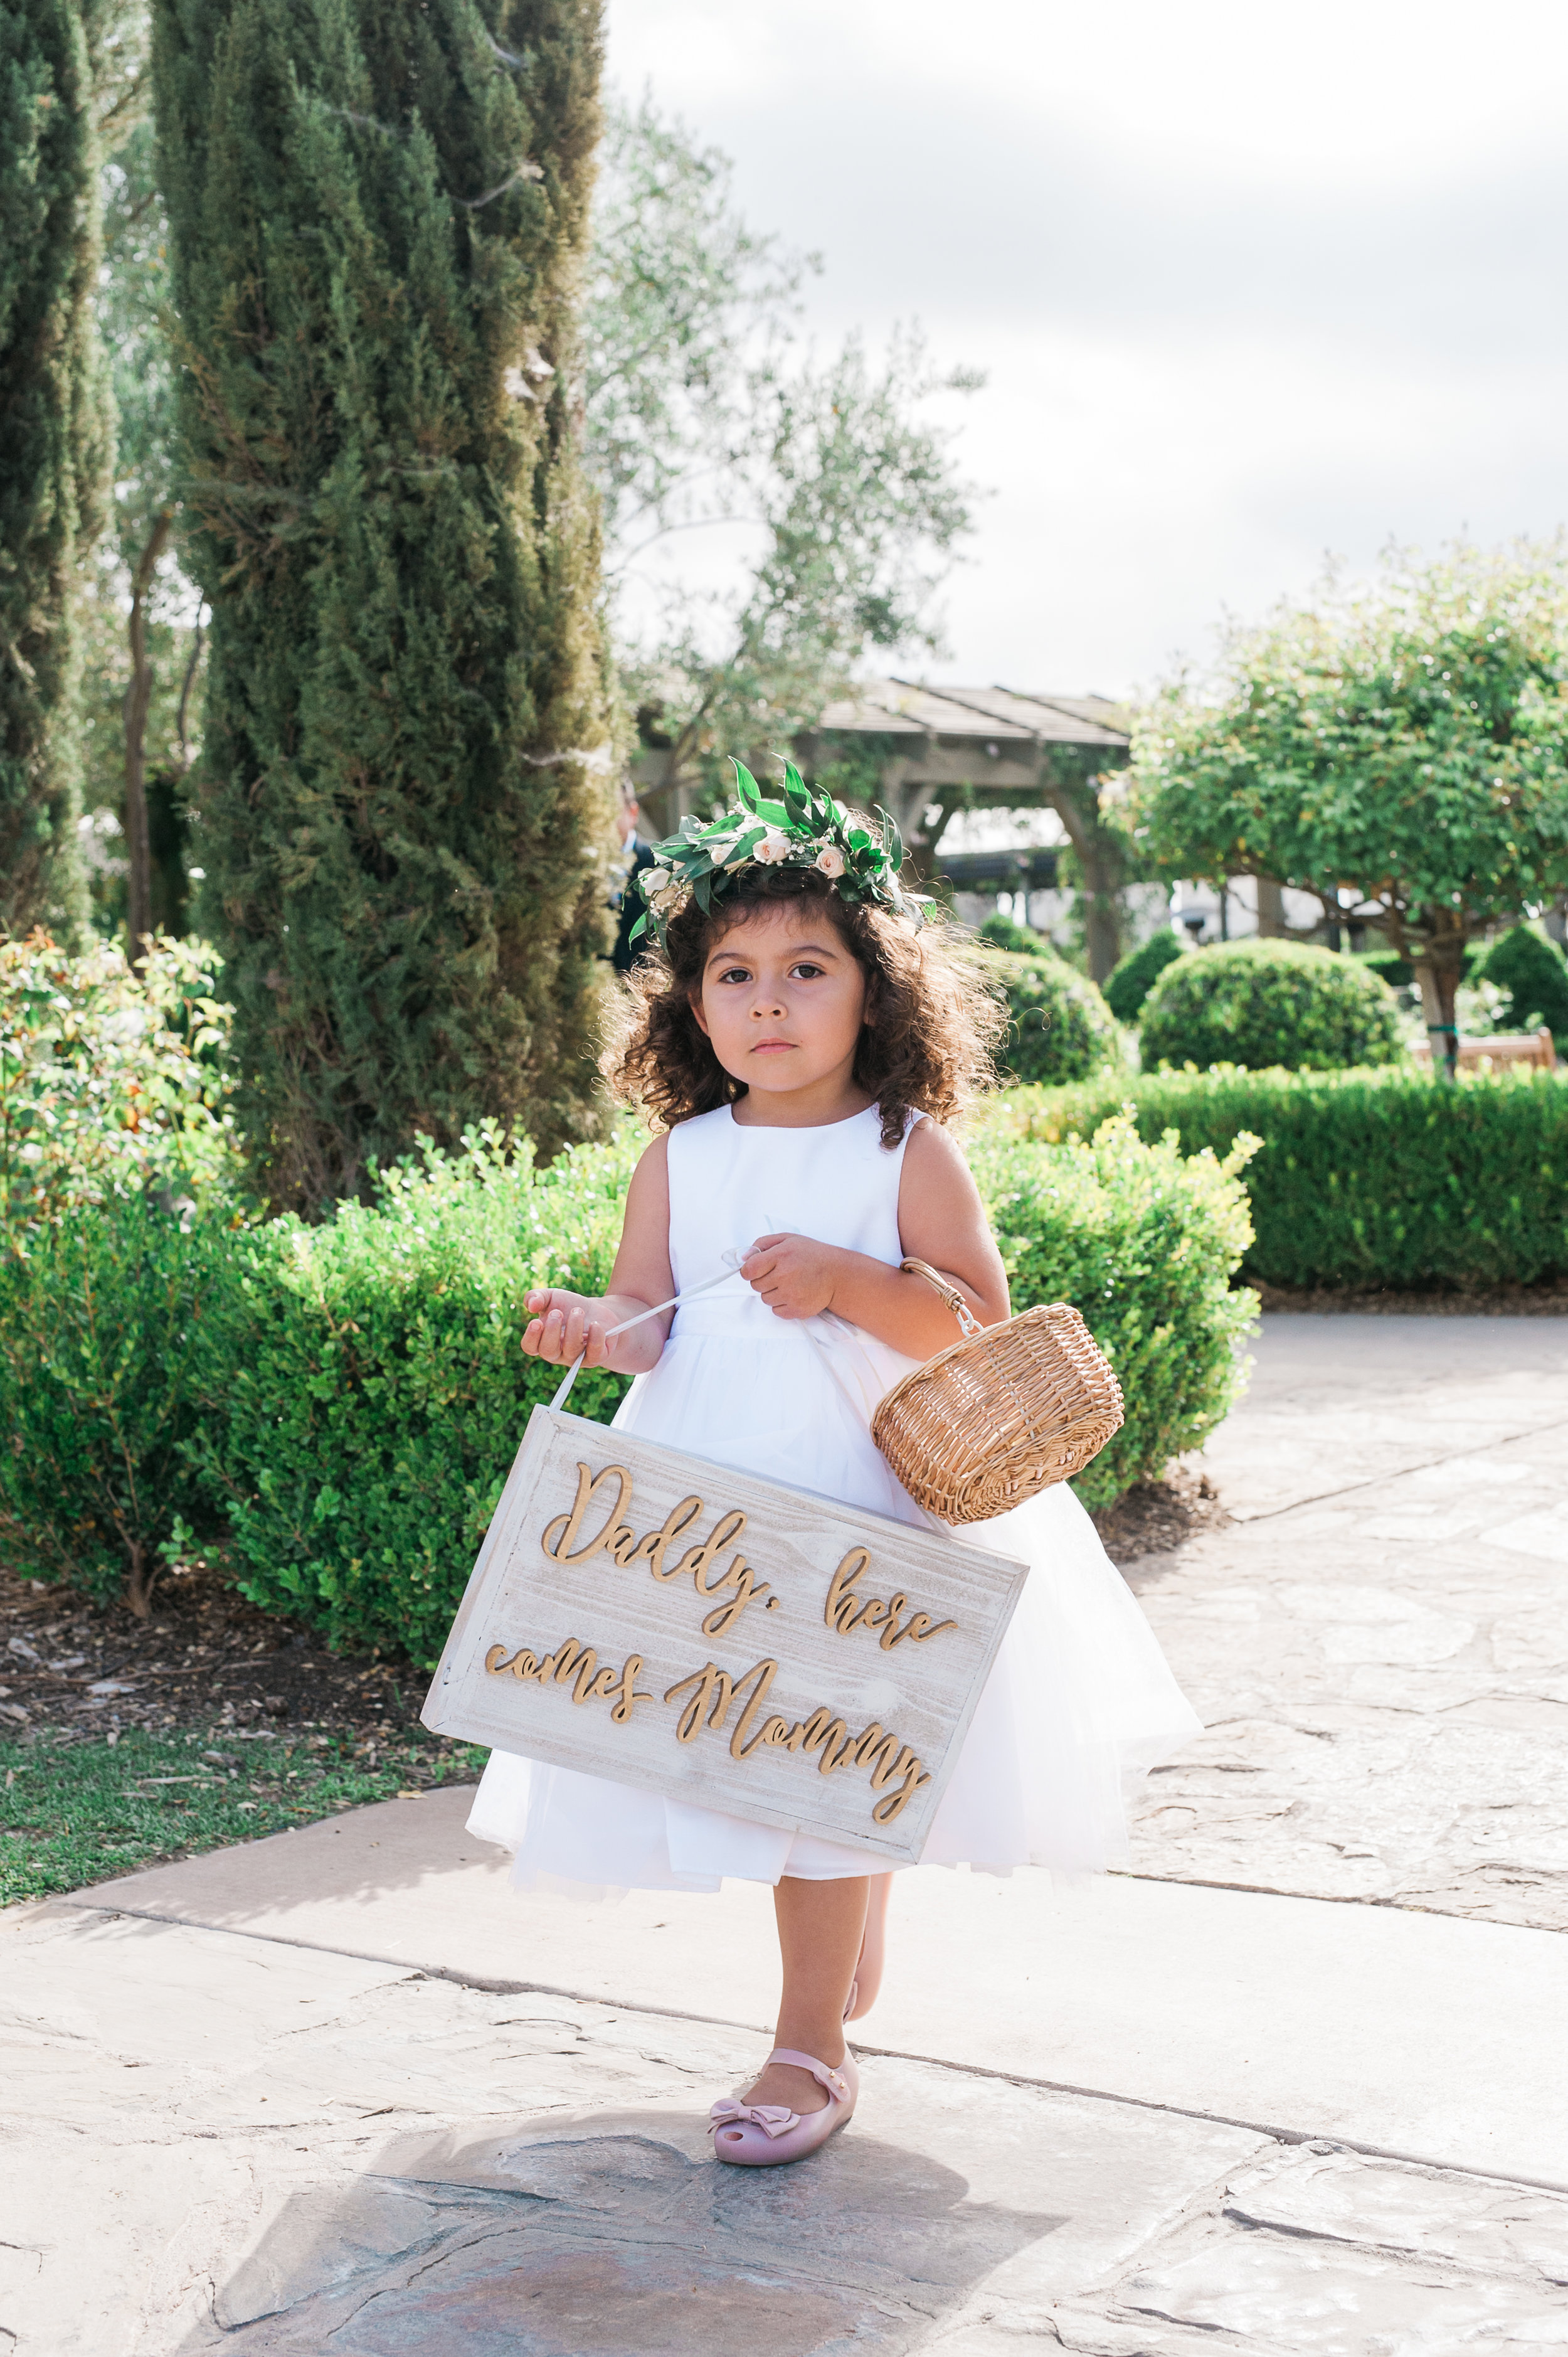 Denise Carlos Wedding - Carissa Woo Photography-0563.jpg